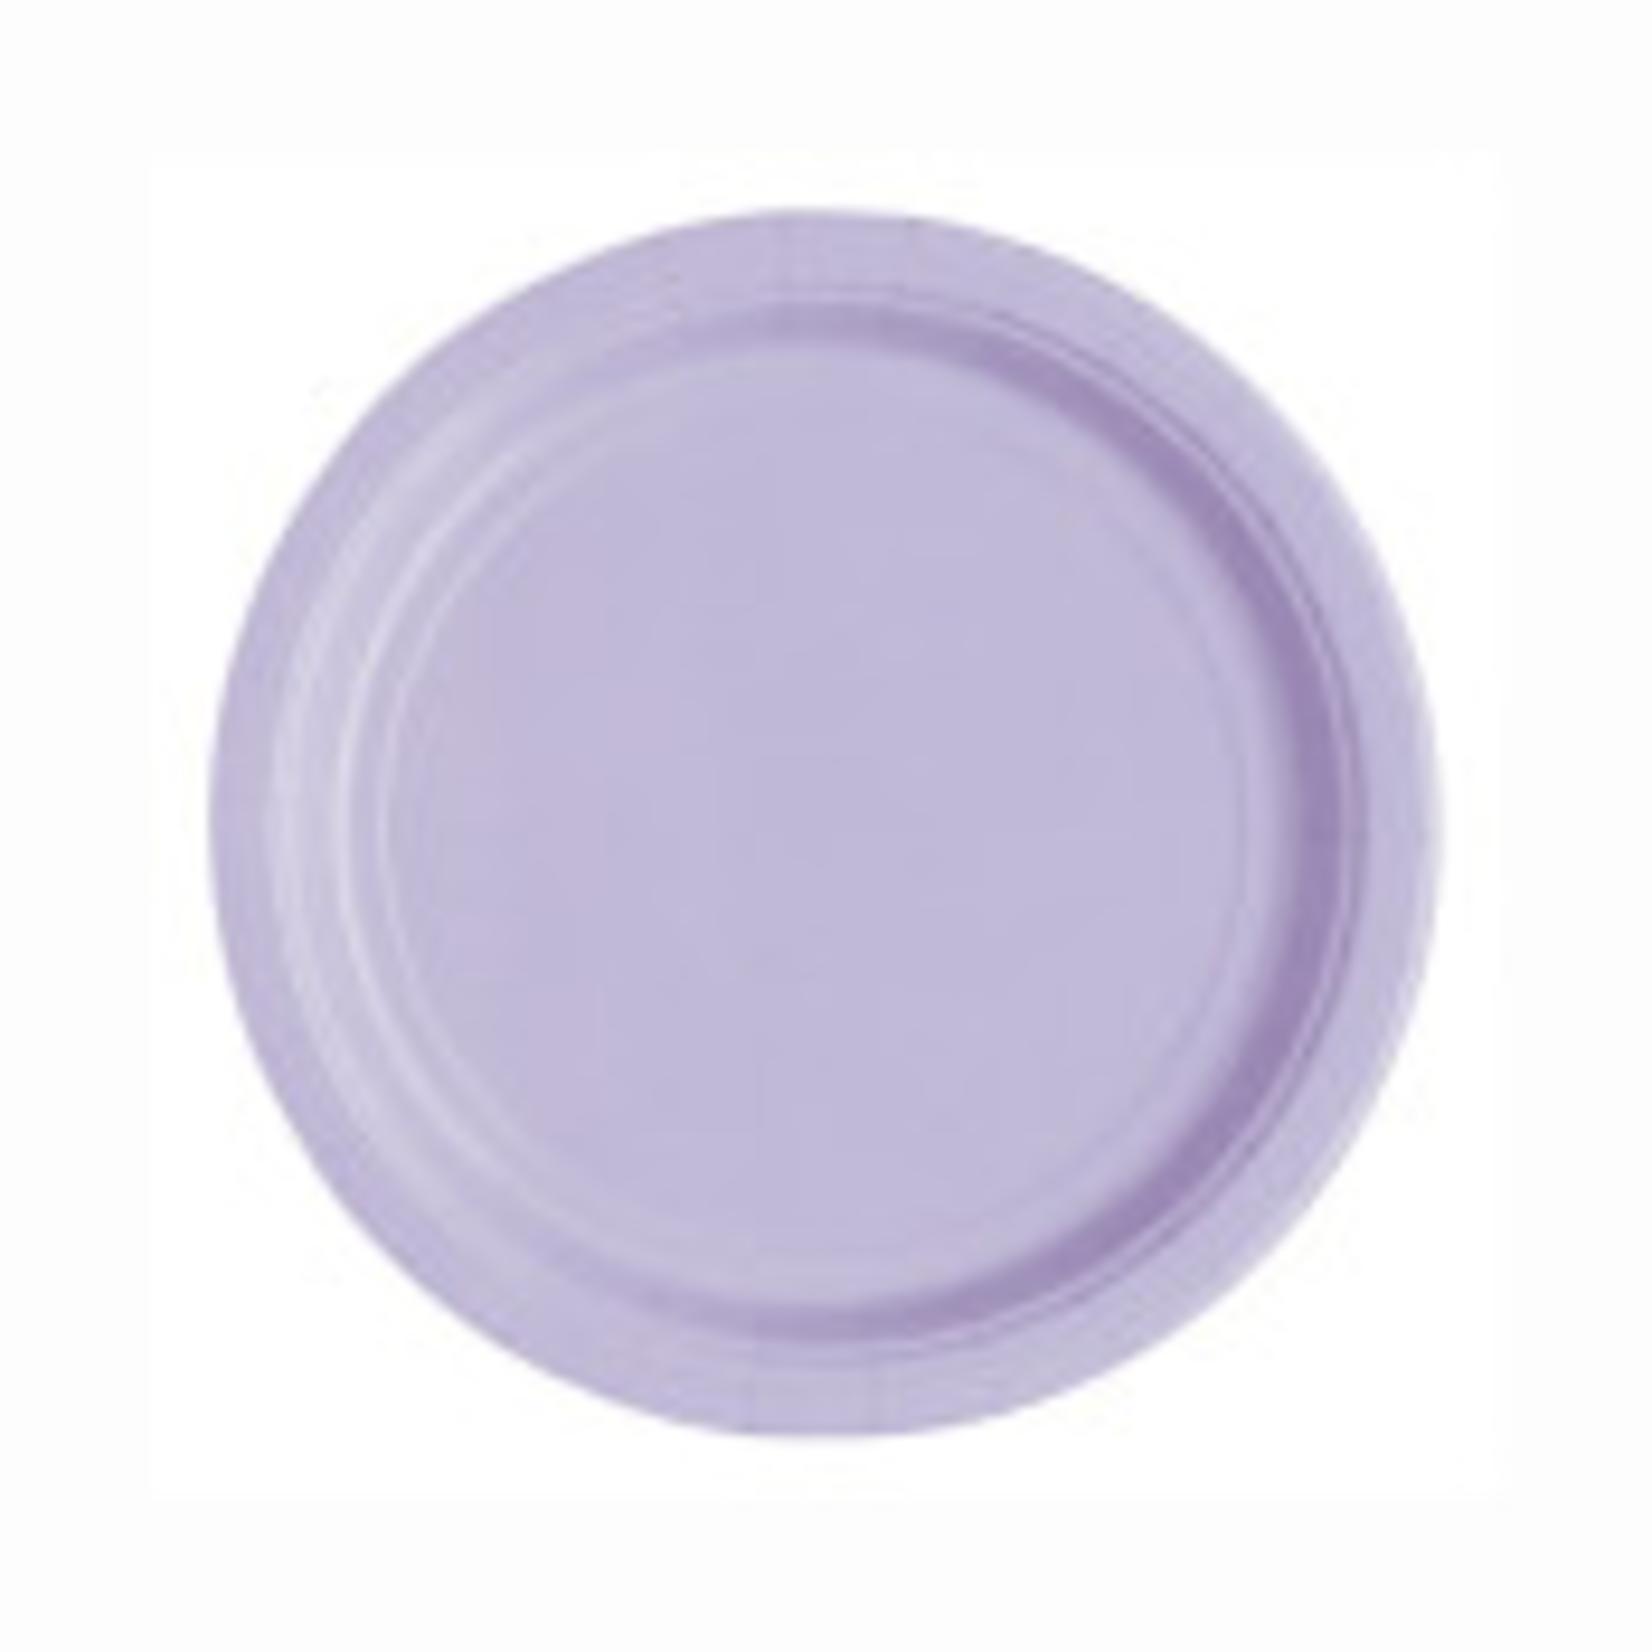 "20PCS 7""  Round Plates LAVENDER SOLID"